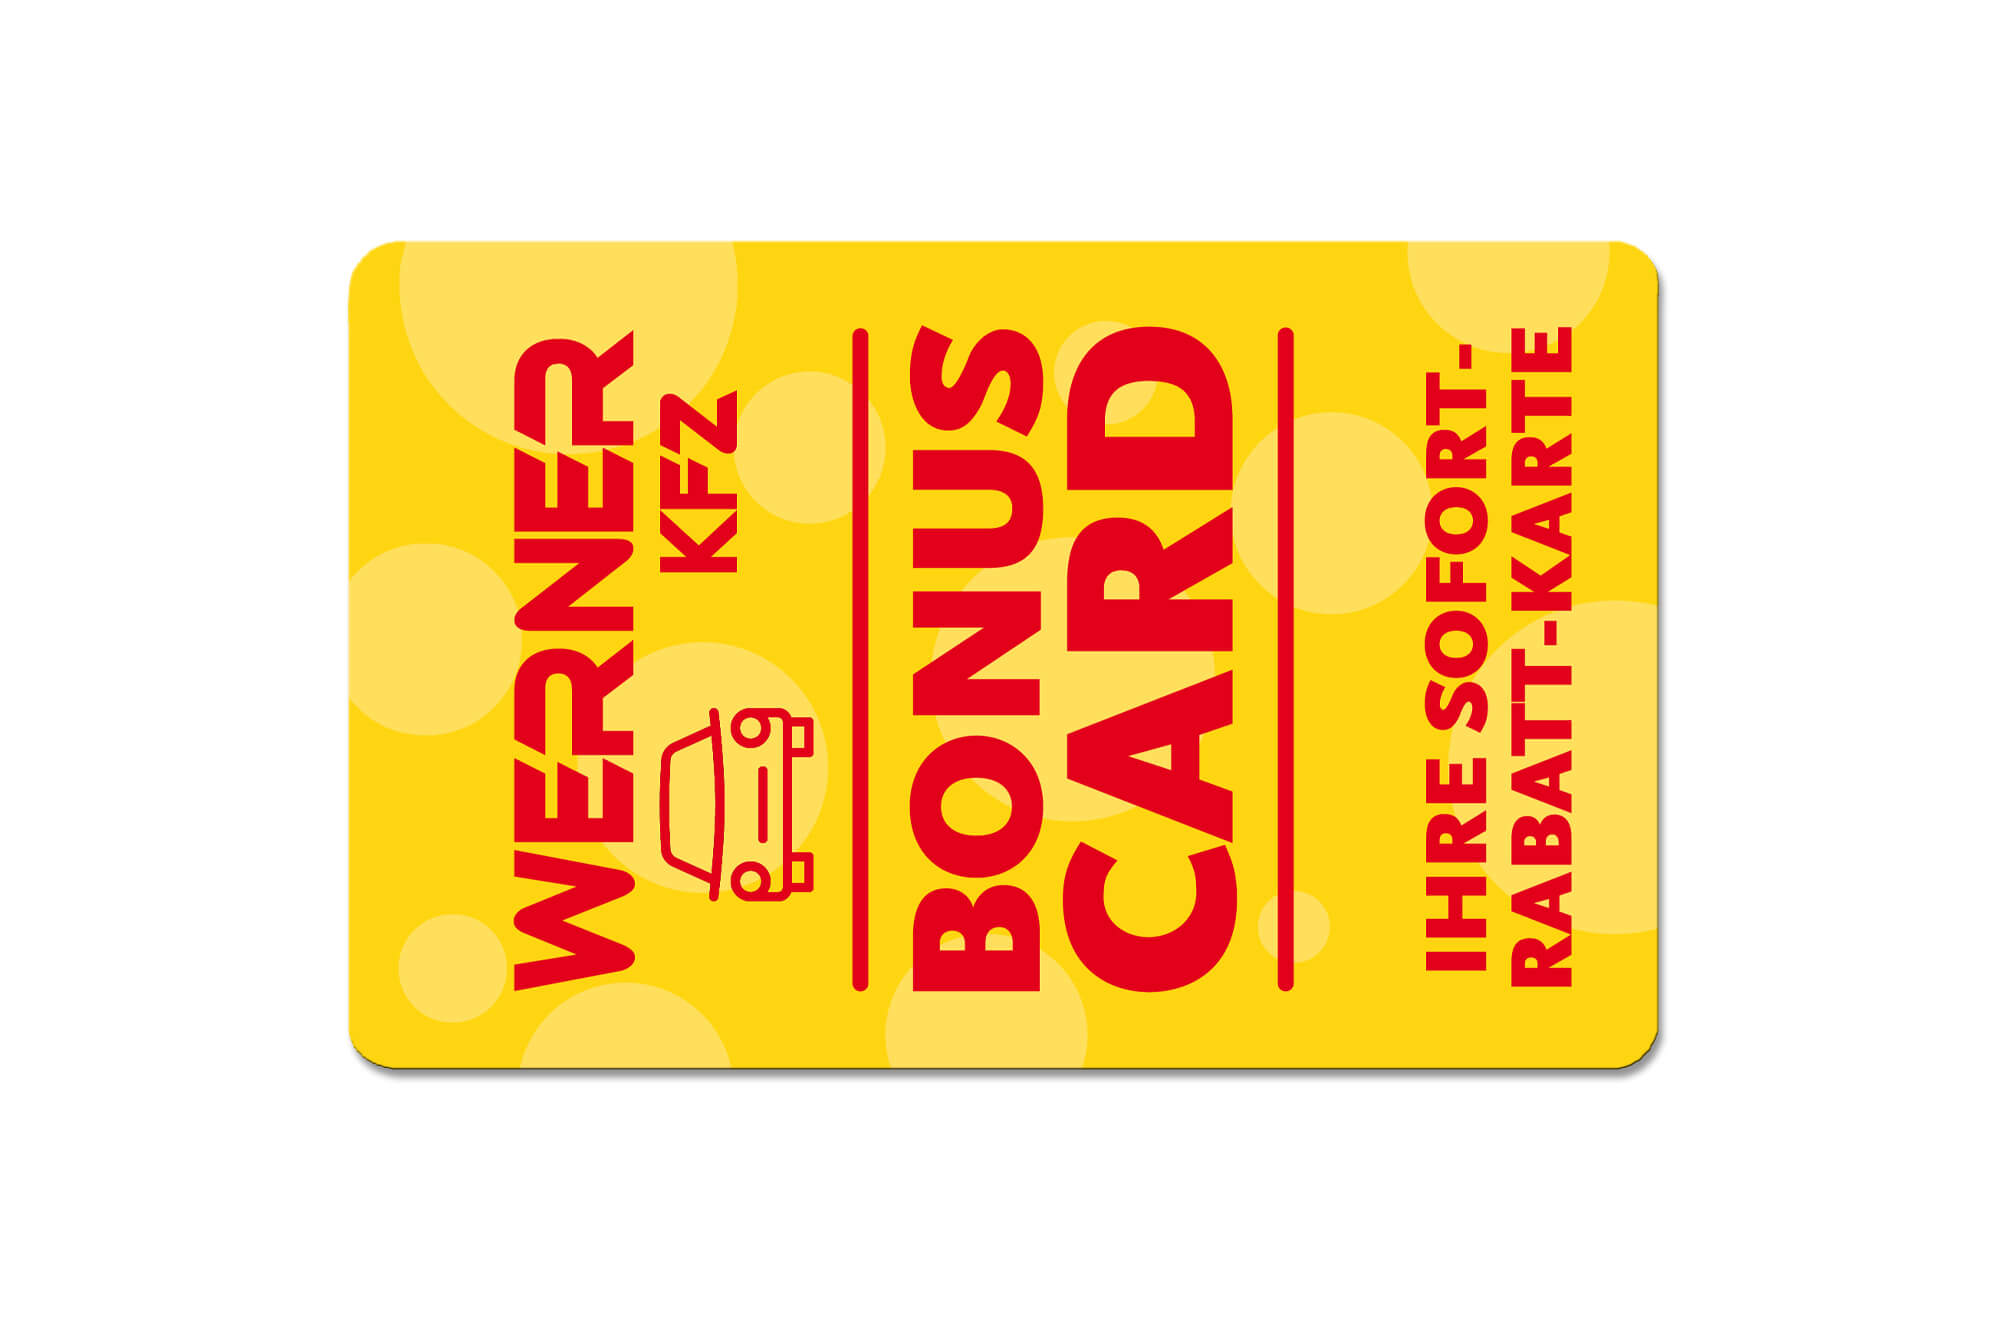 Bonuscard Werner KFZ